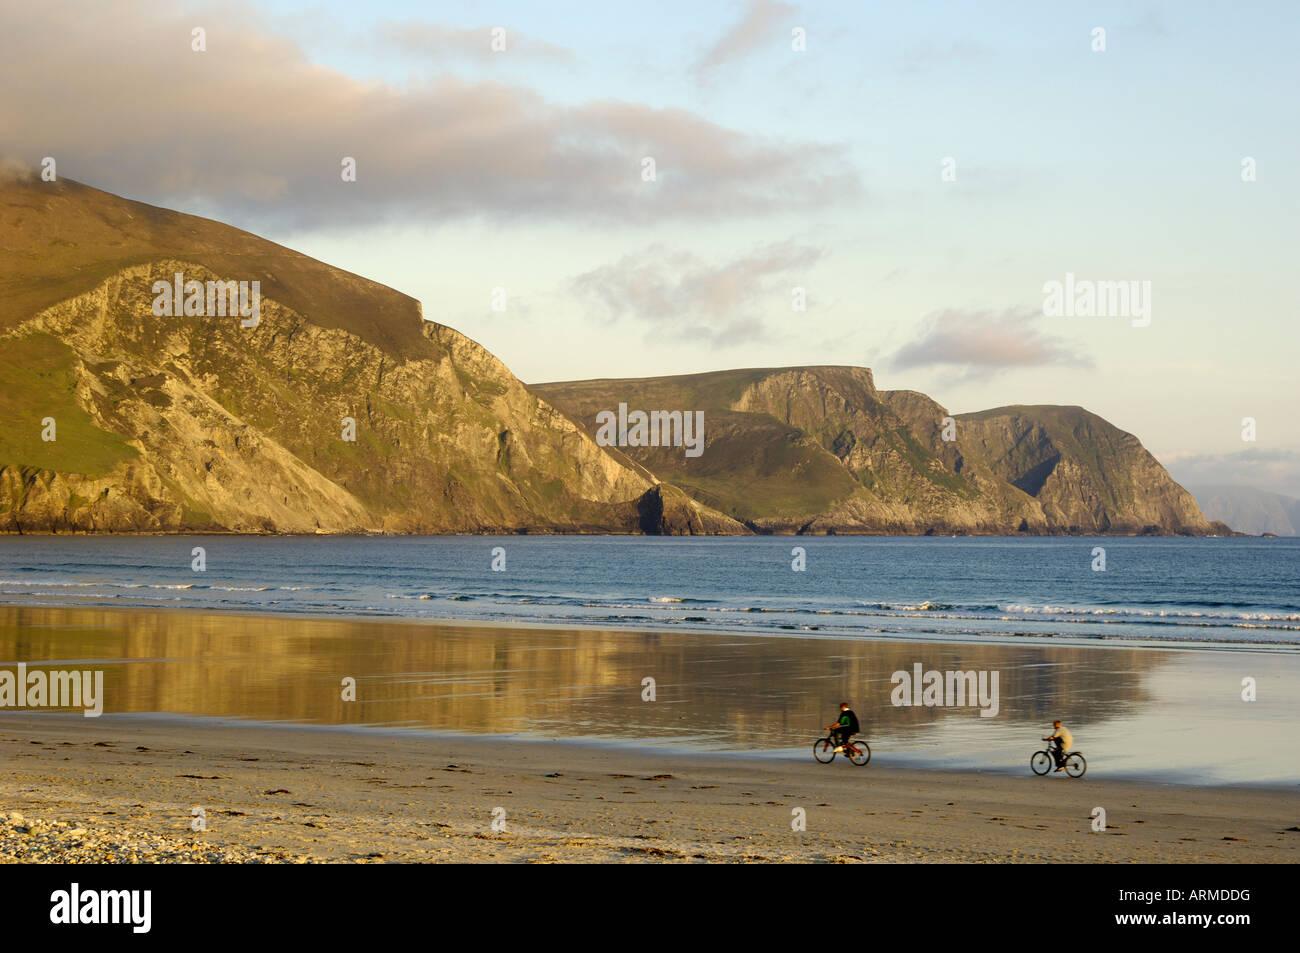 Minaun Cliffs from Keel beach, Achill Island, County Mayo, Connacht, Republic of Ireland (Eire), Europe - Stock Image